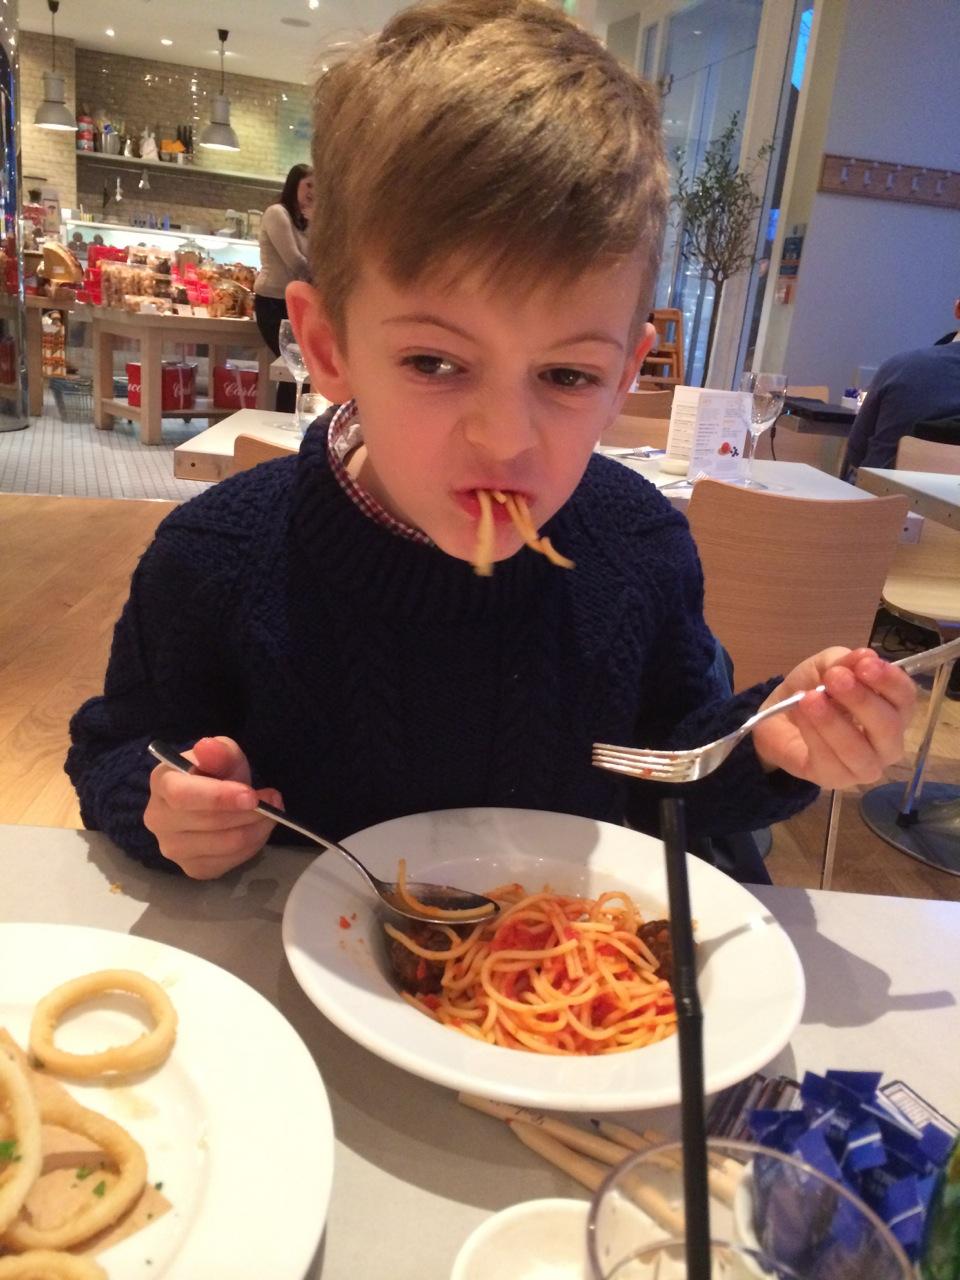 Spaghetti success - mostly!